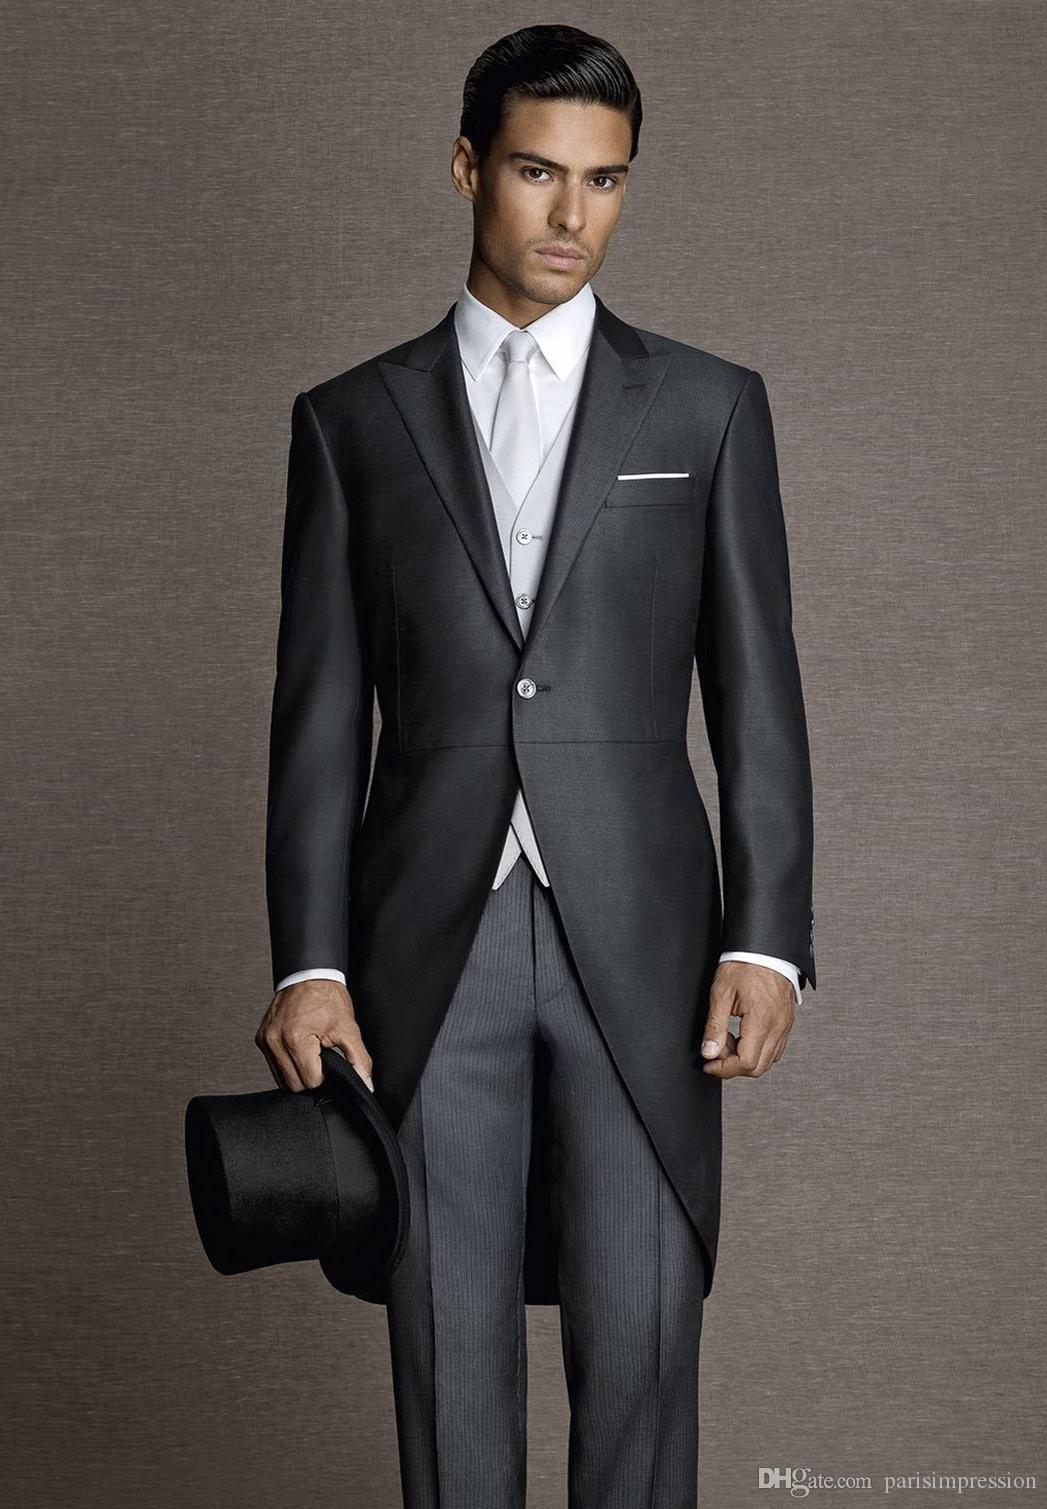 Vintage Black Men Tailcoats Peaked Lapel Wedding Suits For Men